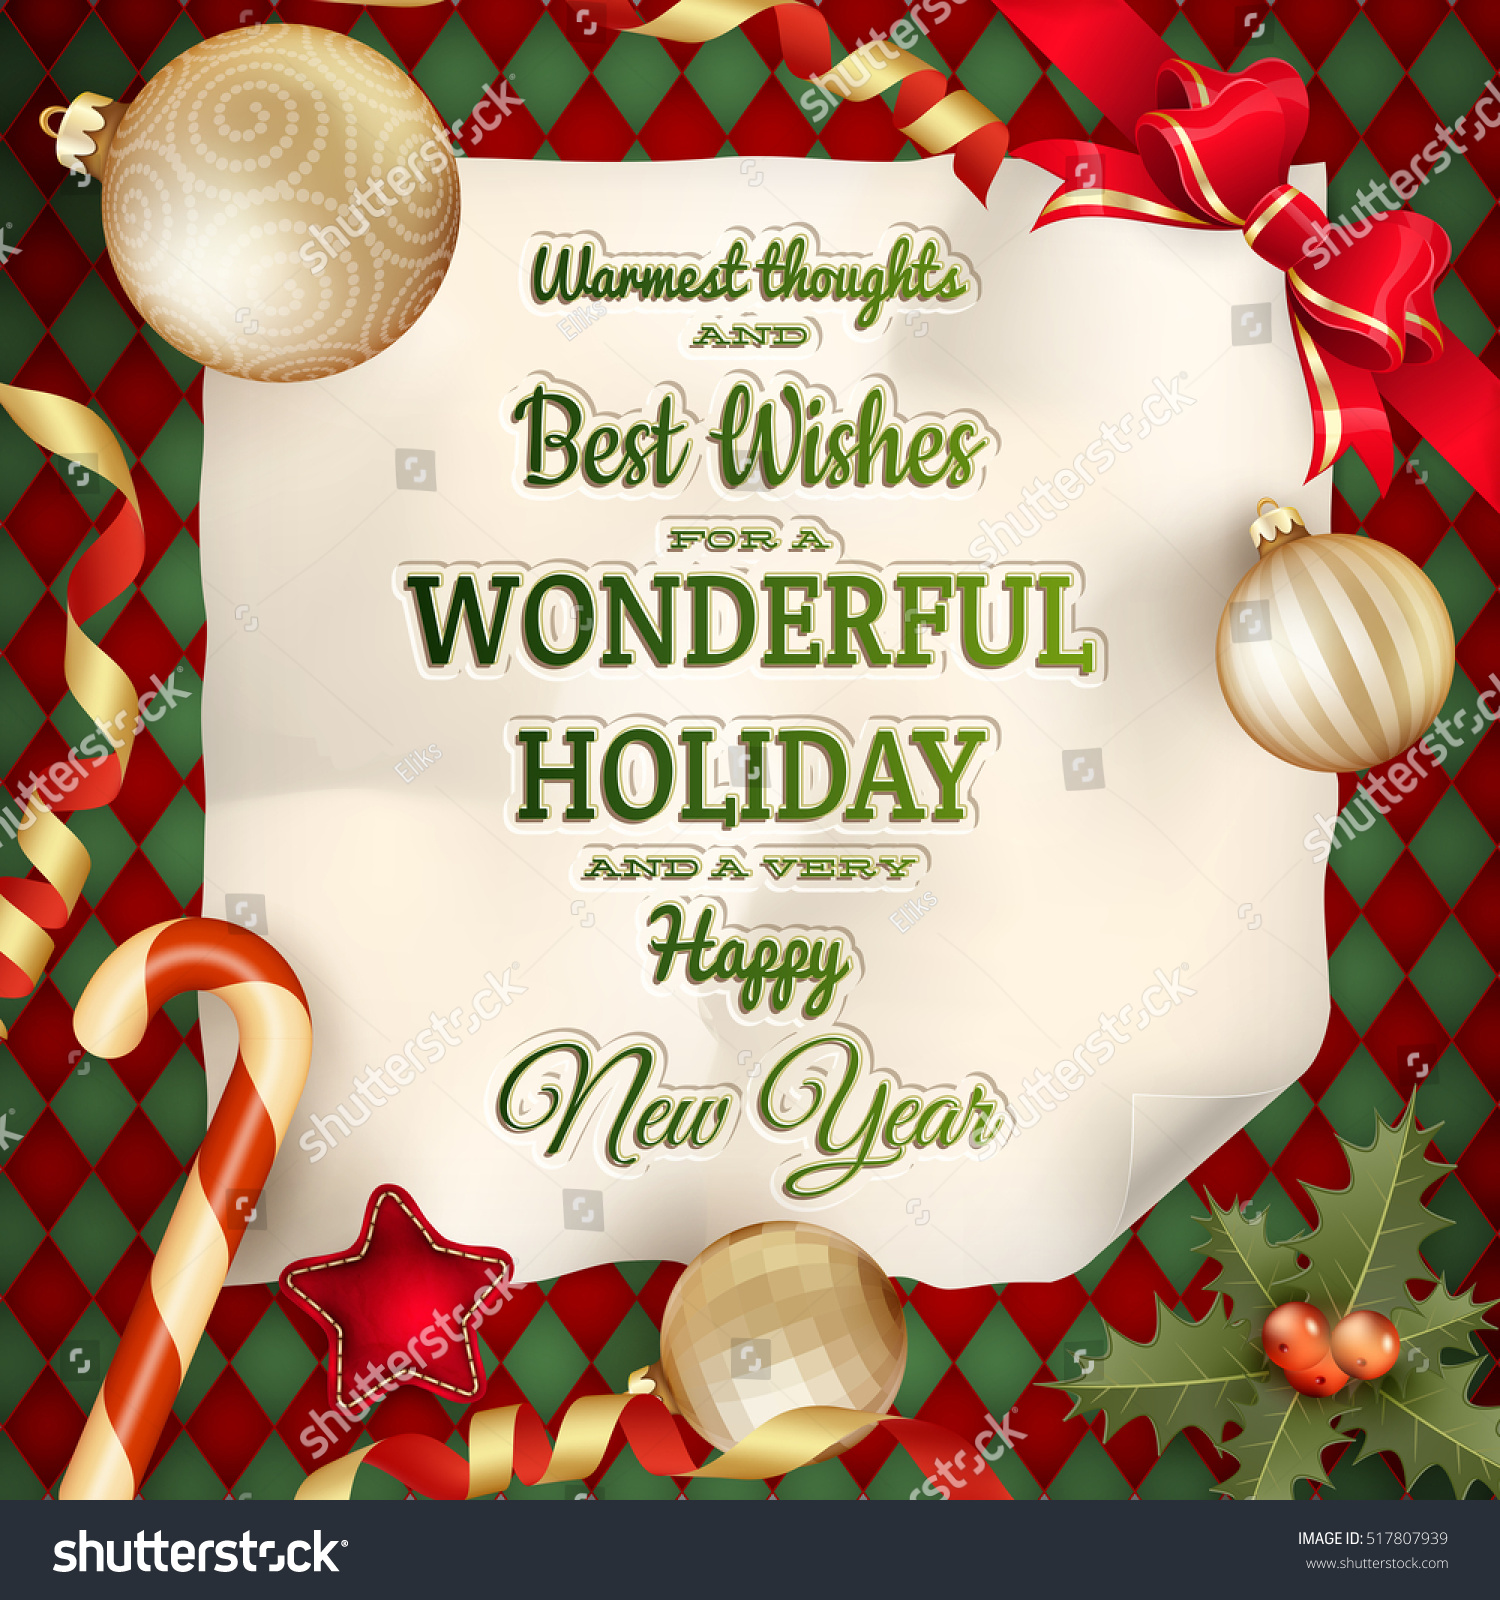 Holidays Greeting Christmas Card Eps 10 Stock Vector Royalty Free